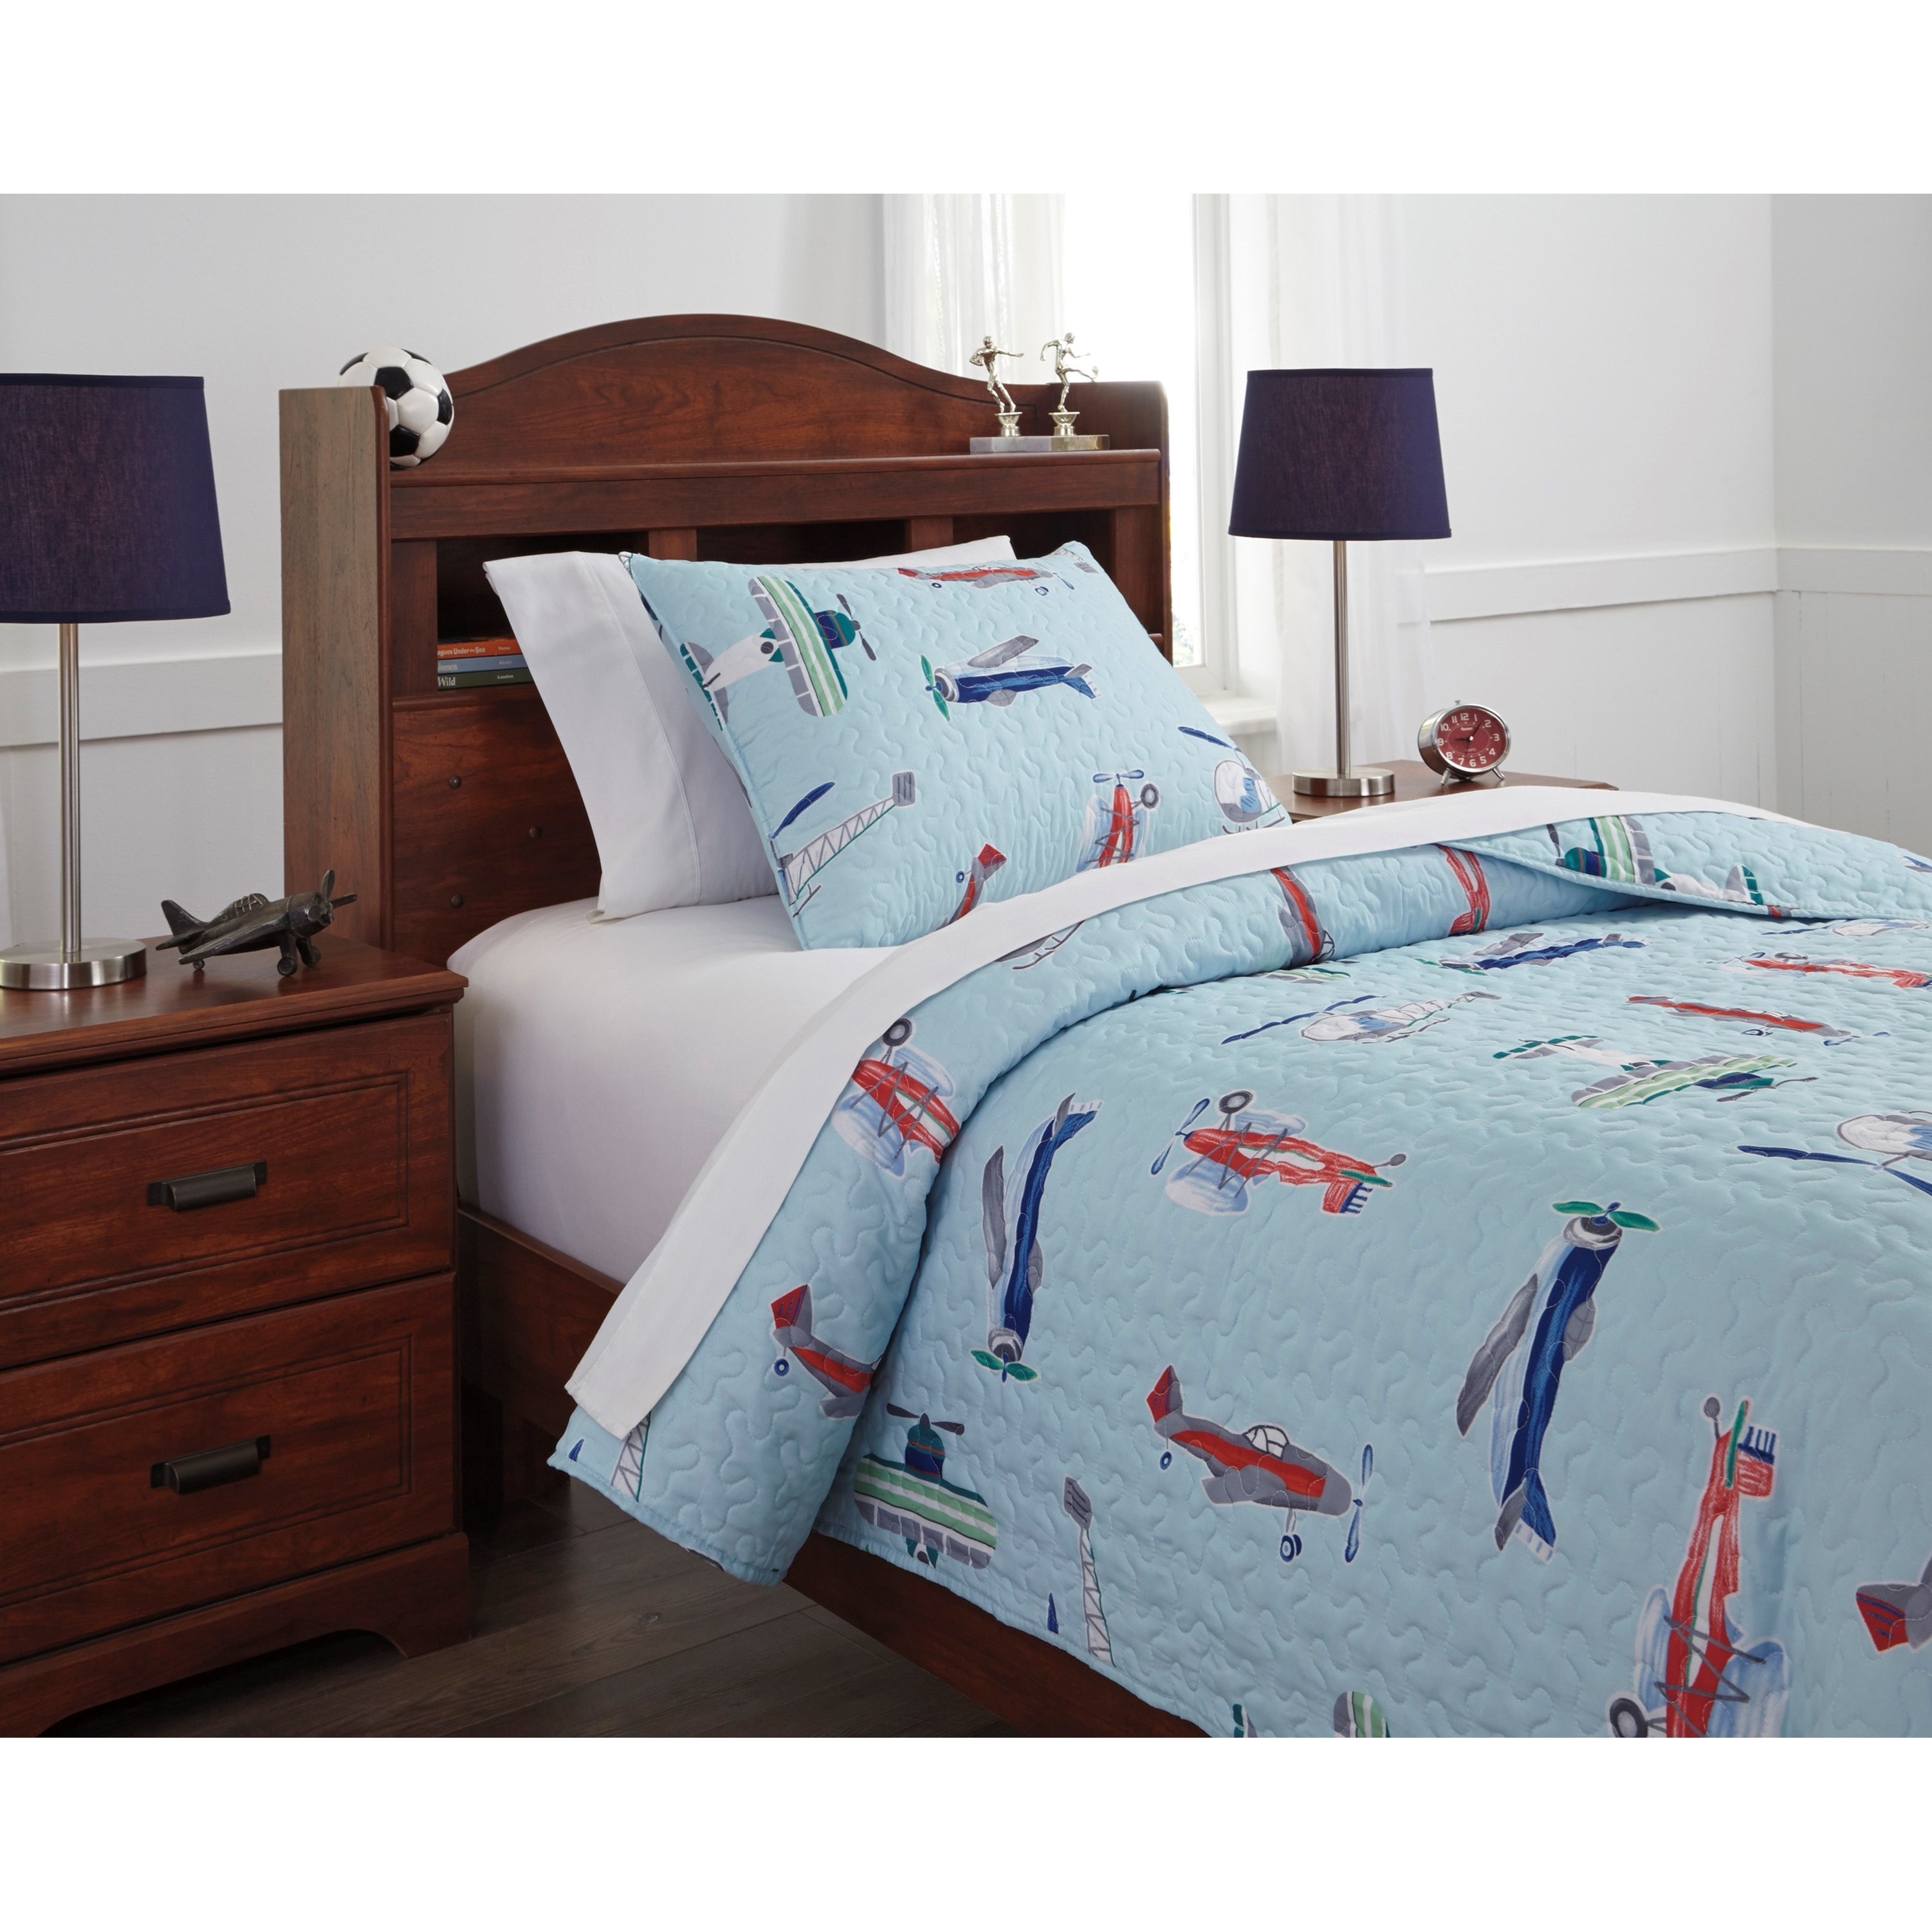 Signature Design By Ashley Bedding Sets Q320001t Twin Mcallen Quilt Set Household Furniture